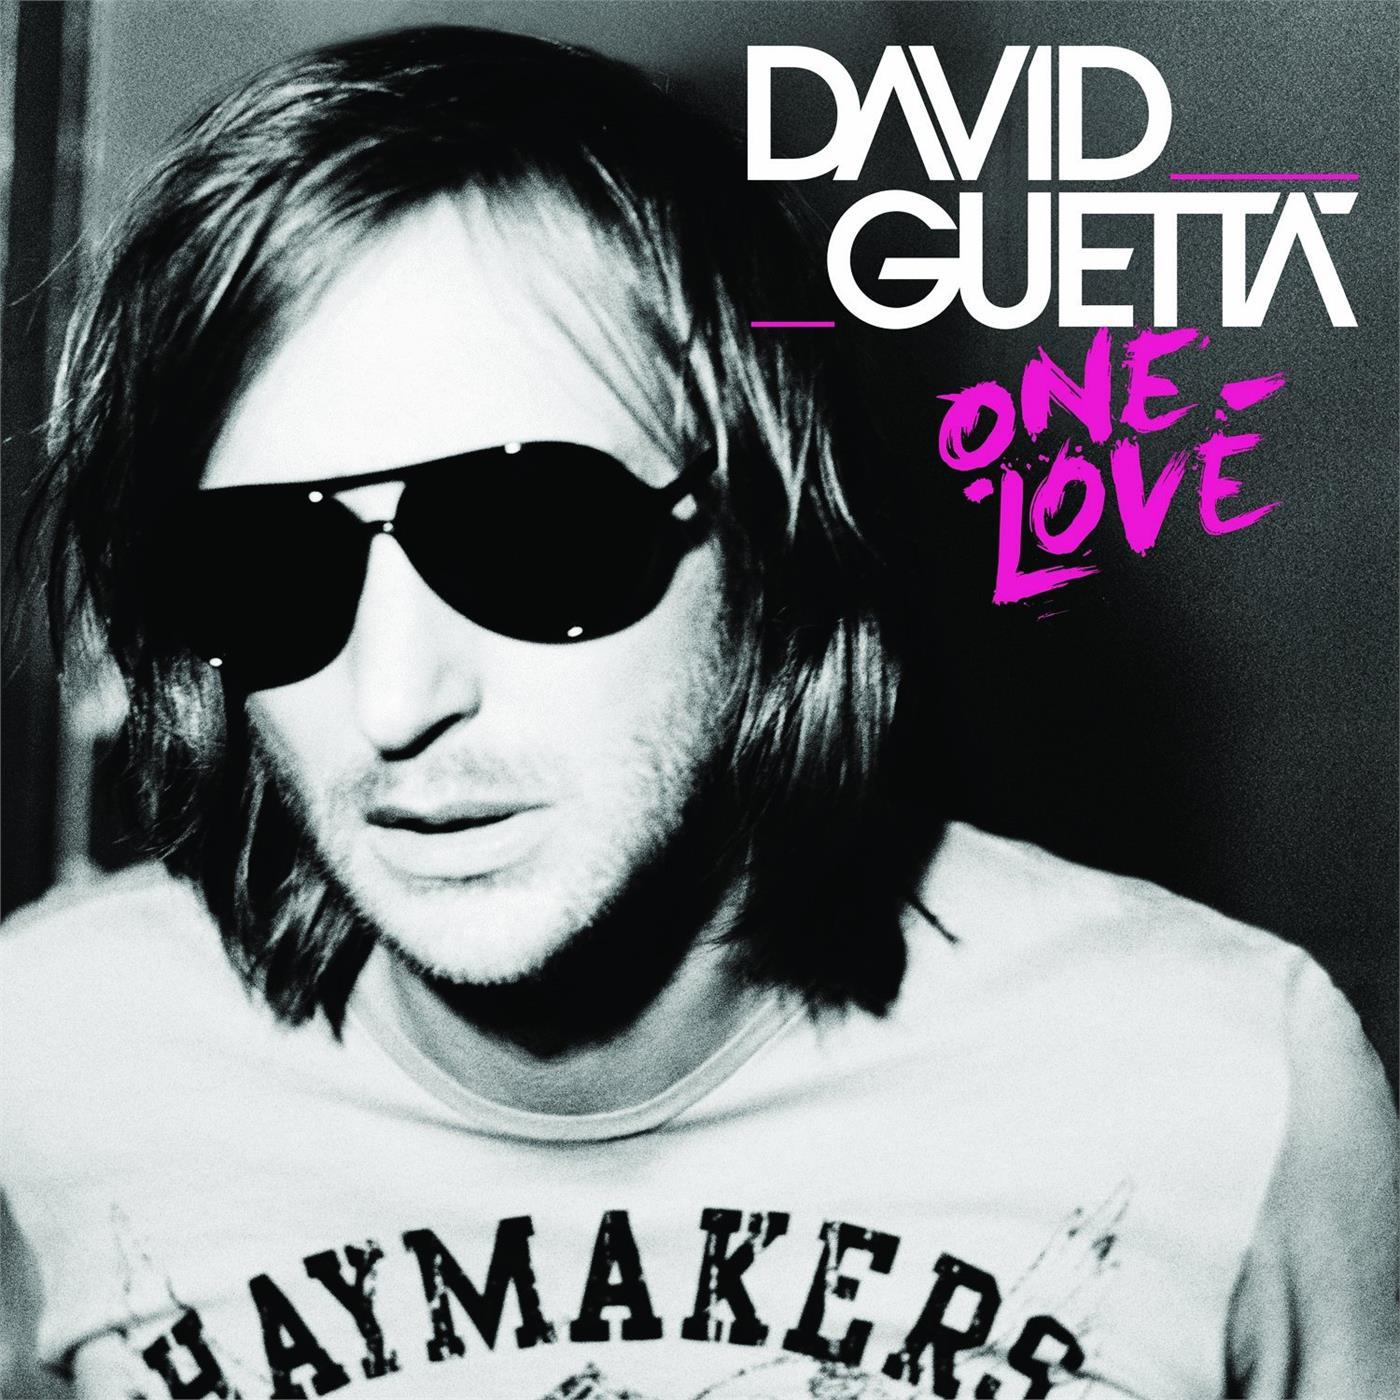 David Guetta - One Love [LP]